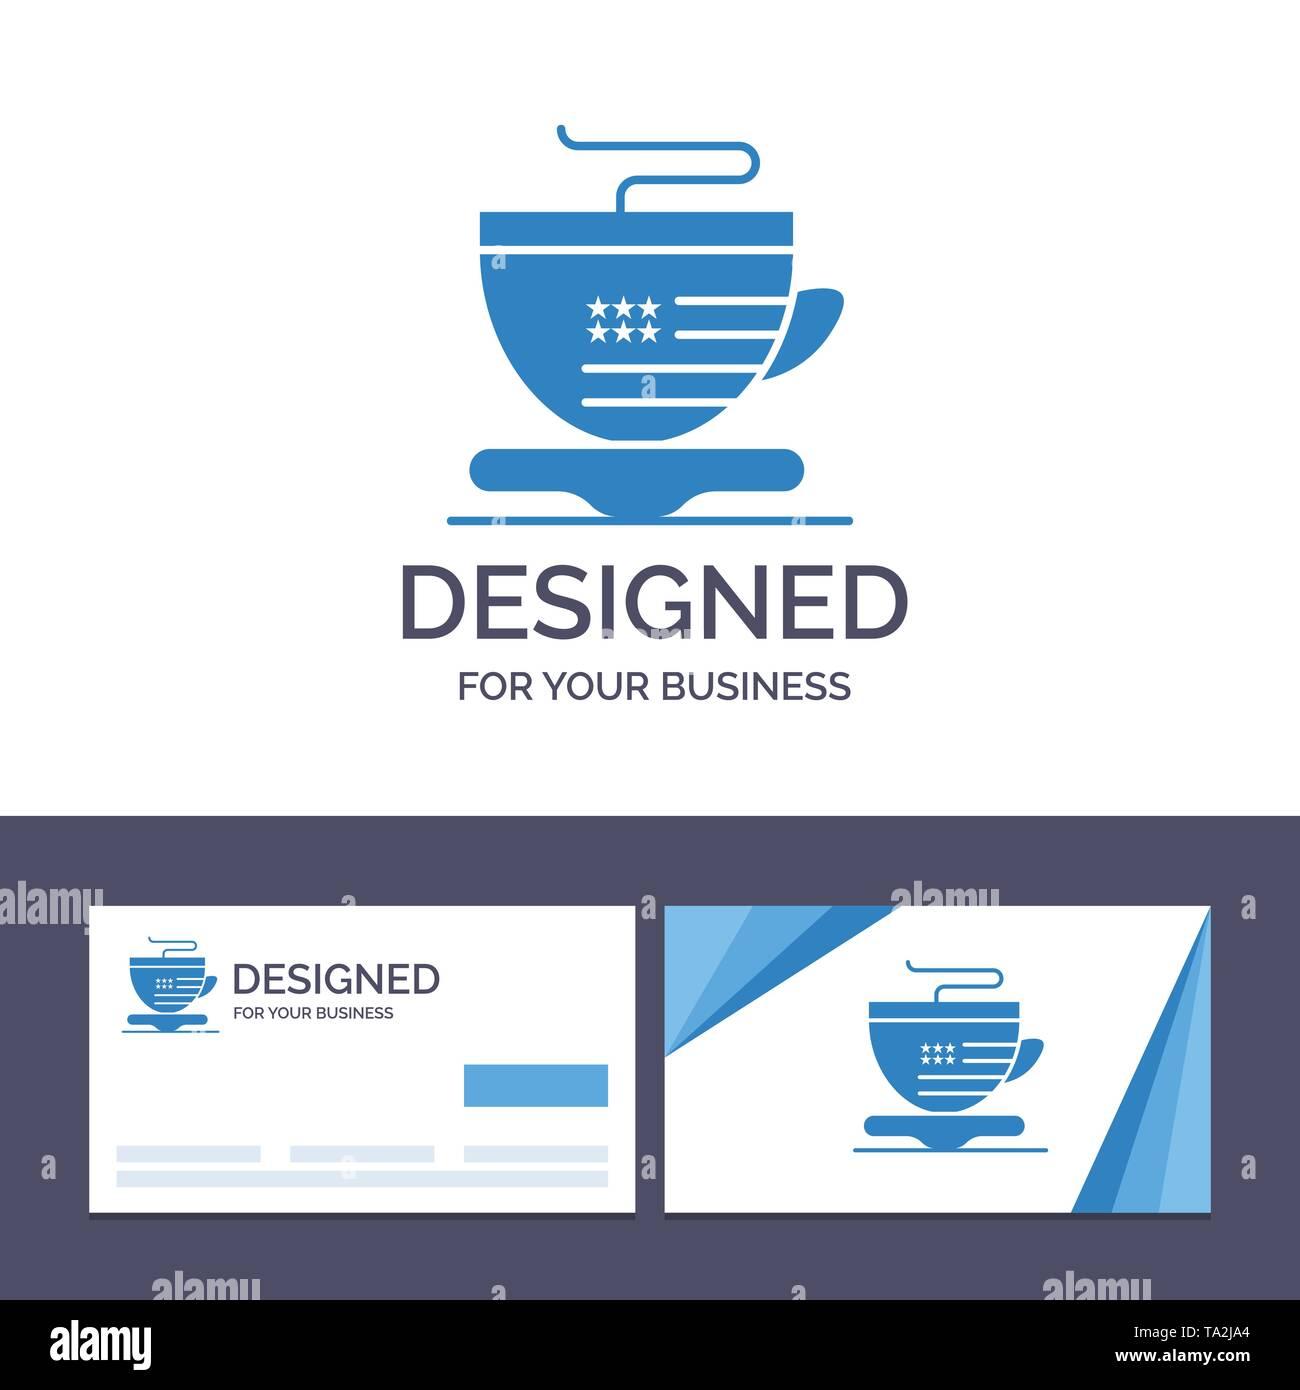 Creative Business Card und Logo Vorlage Tee, Becher, Kaffee, Usa Vector Illustration Stockbild